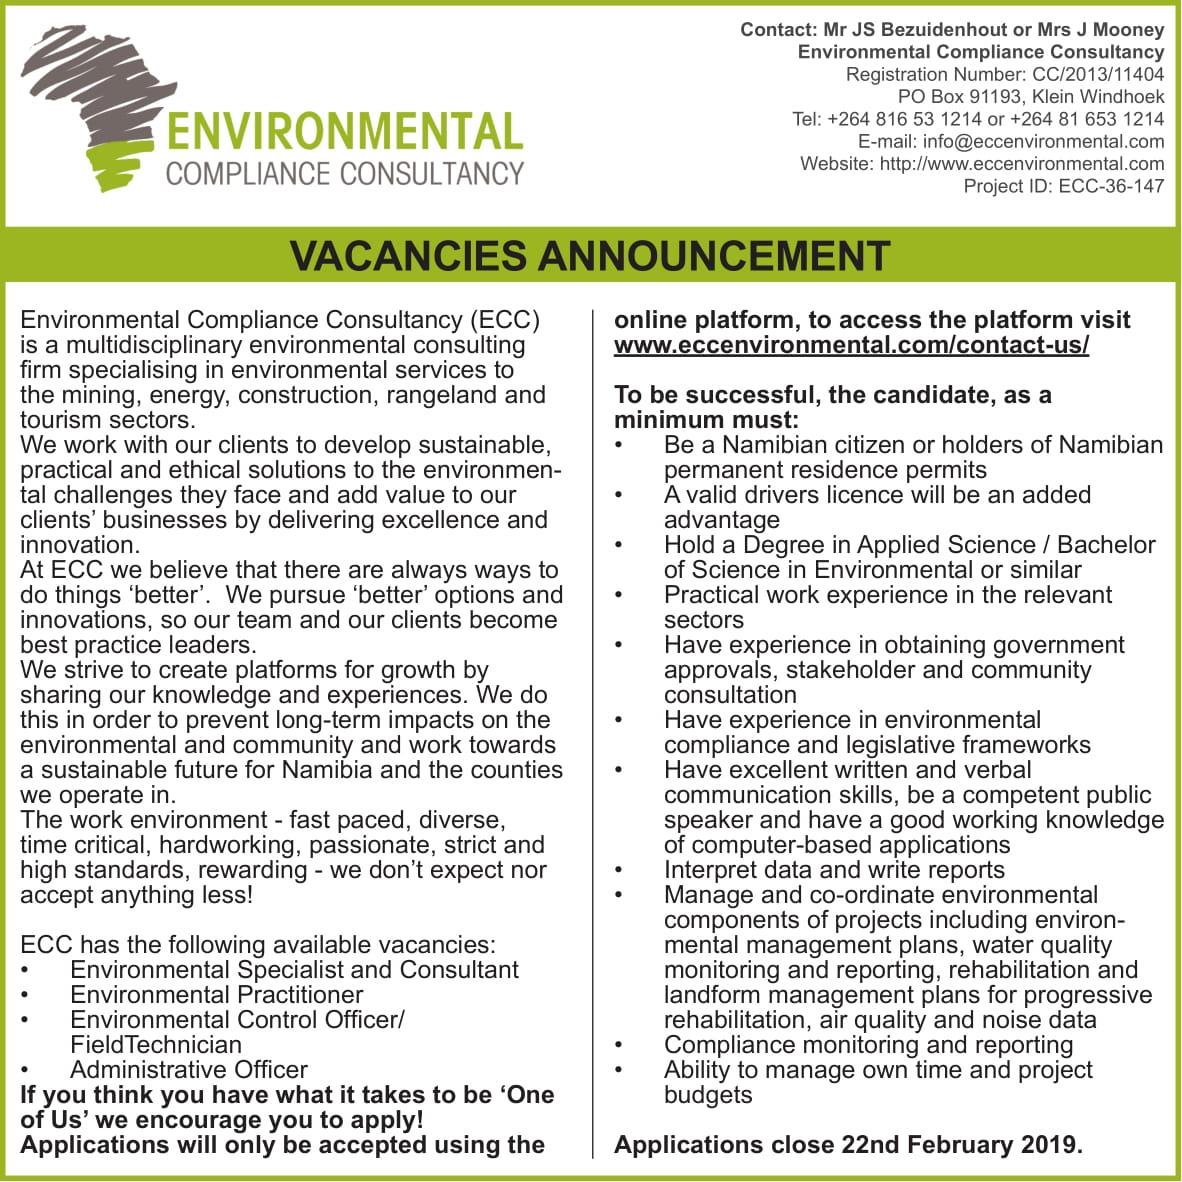 Environmental Compliance Consultancy